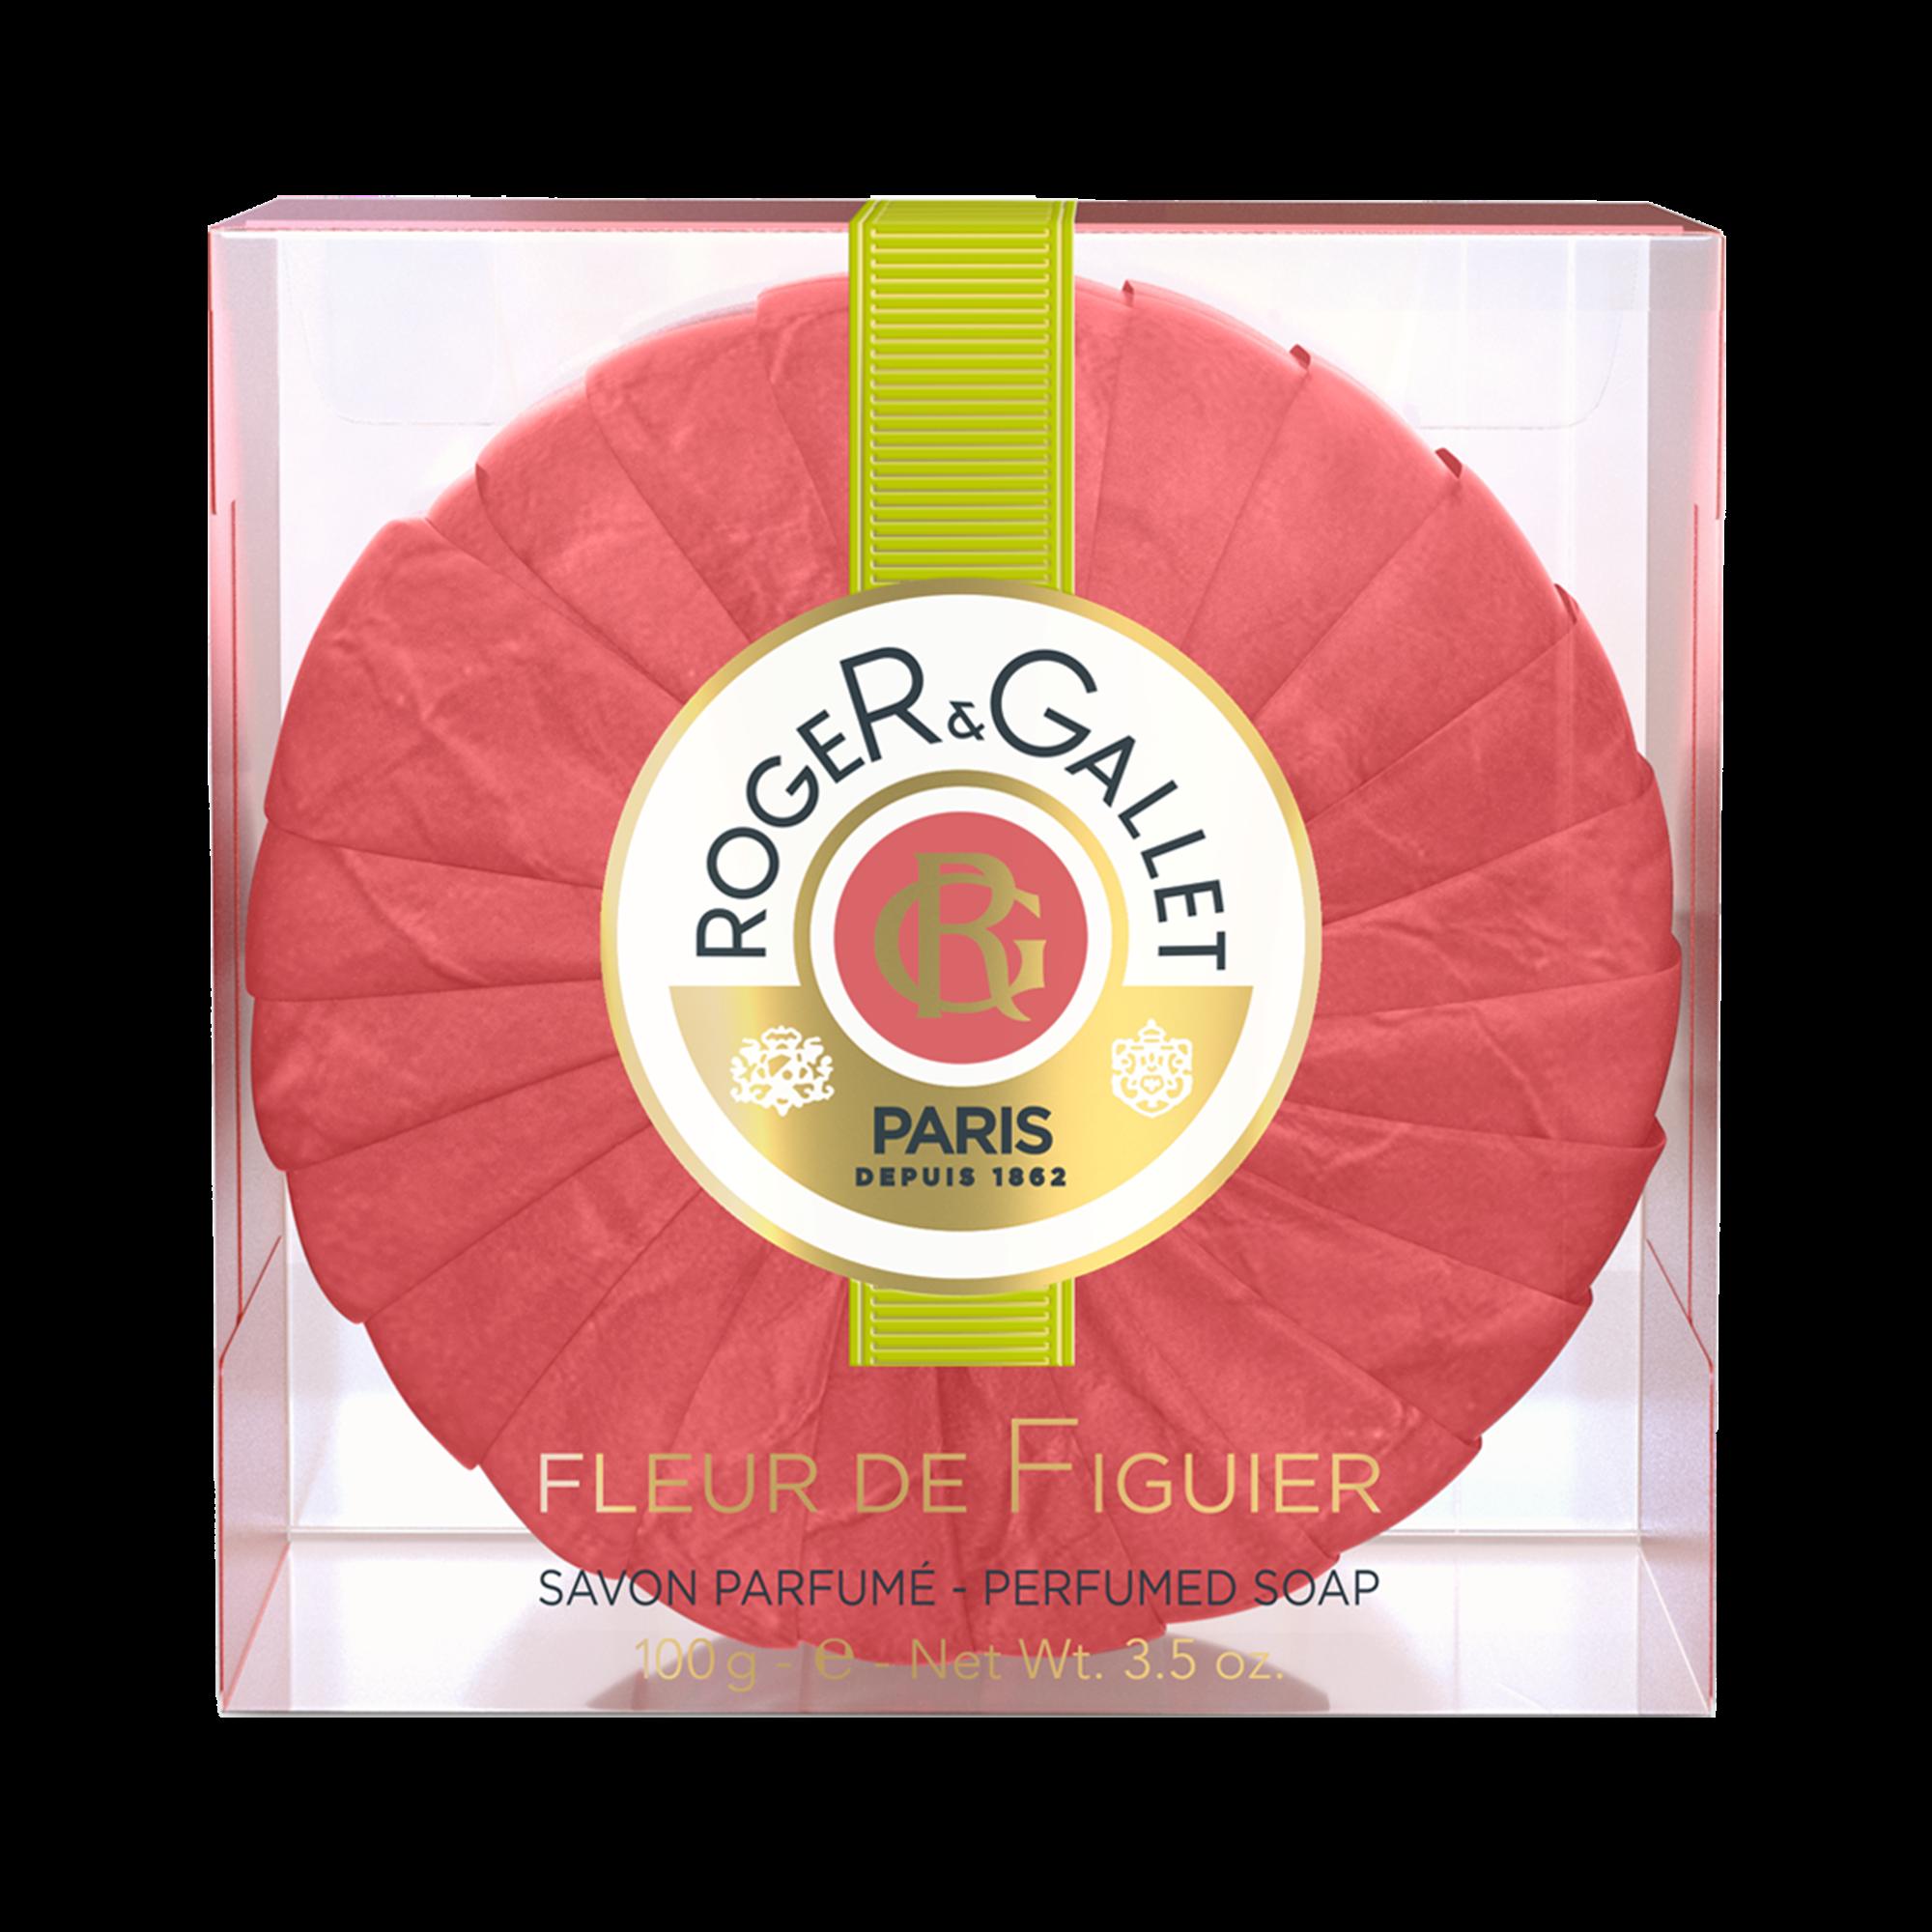 Fleur de Figuier - Seife Reisebox